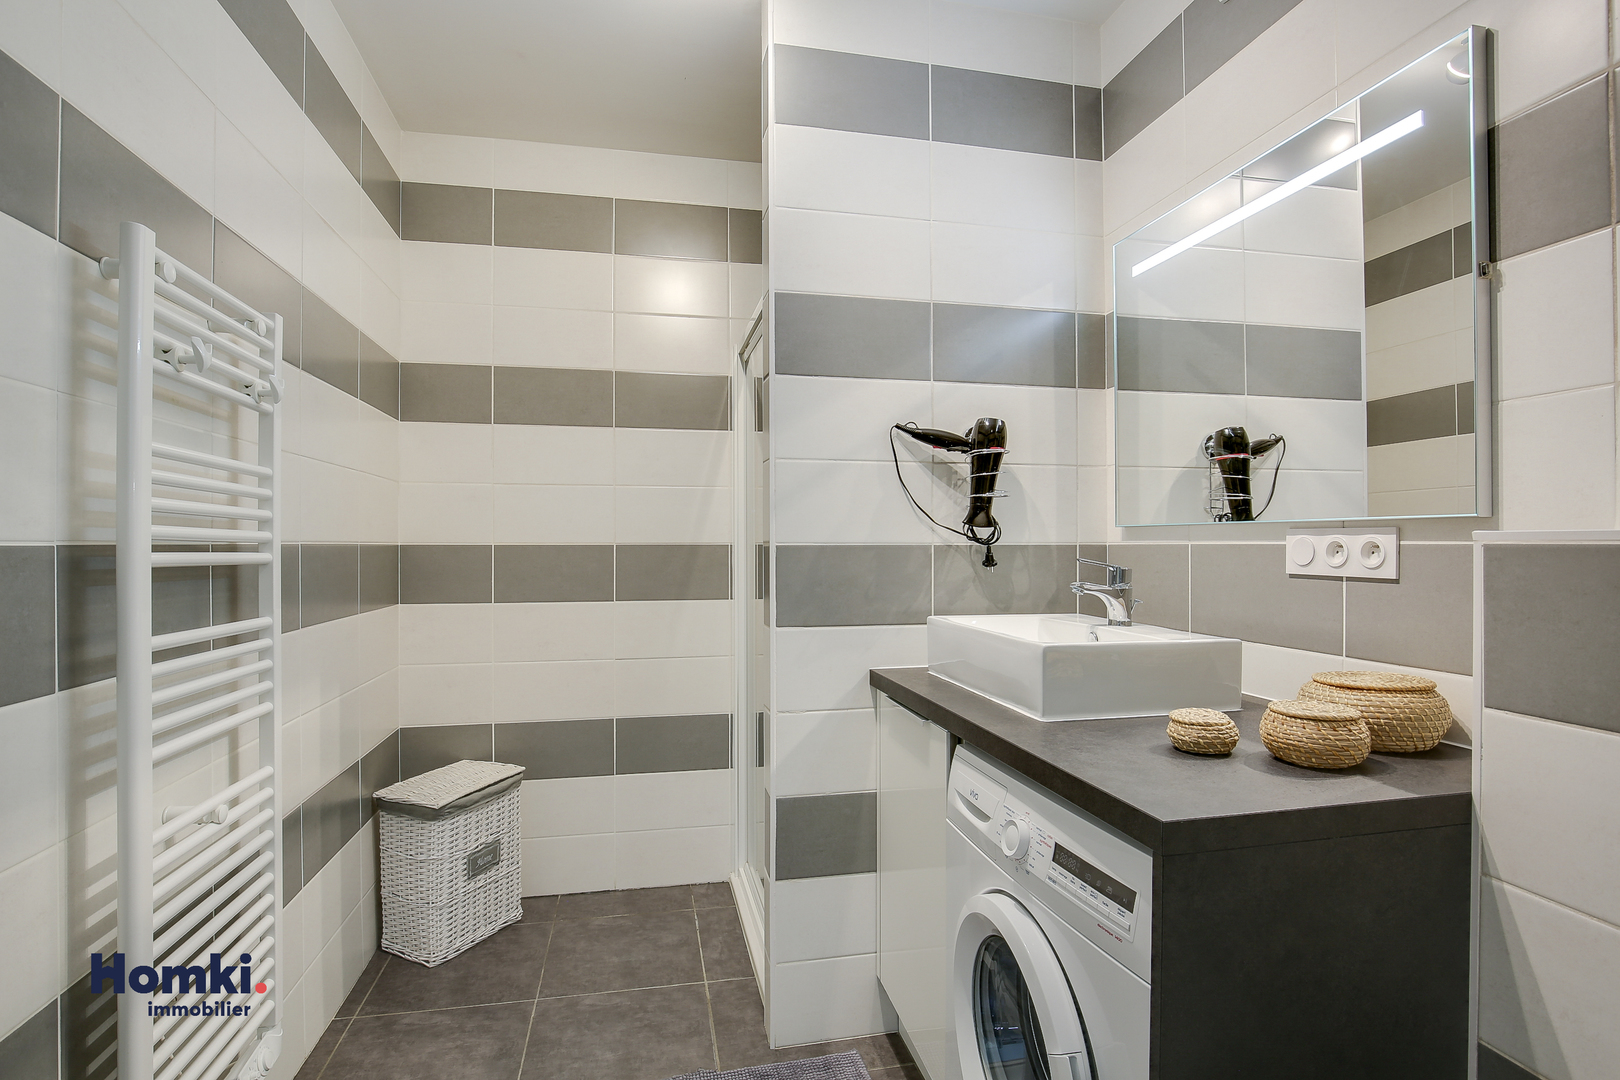 Appartement I 53m² I T2 I 69580 | photo 7